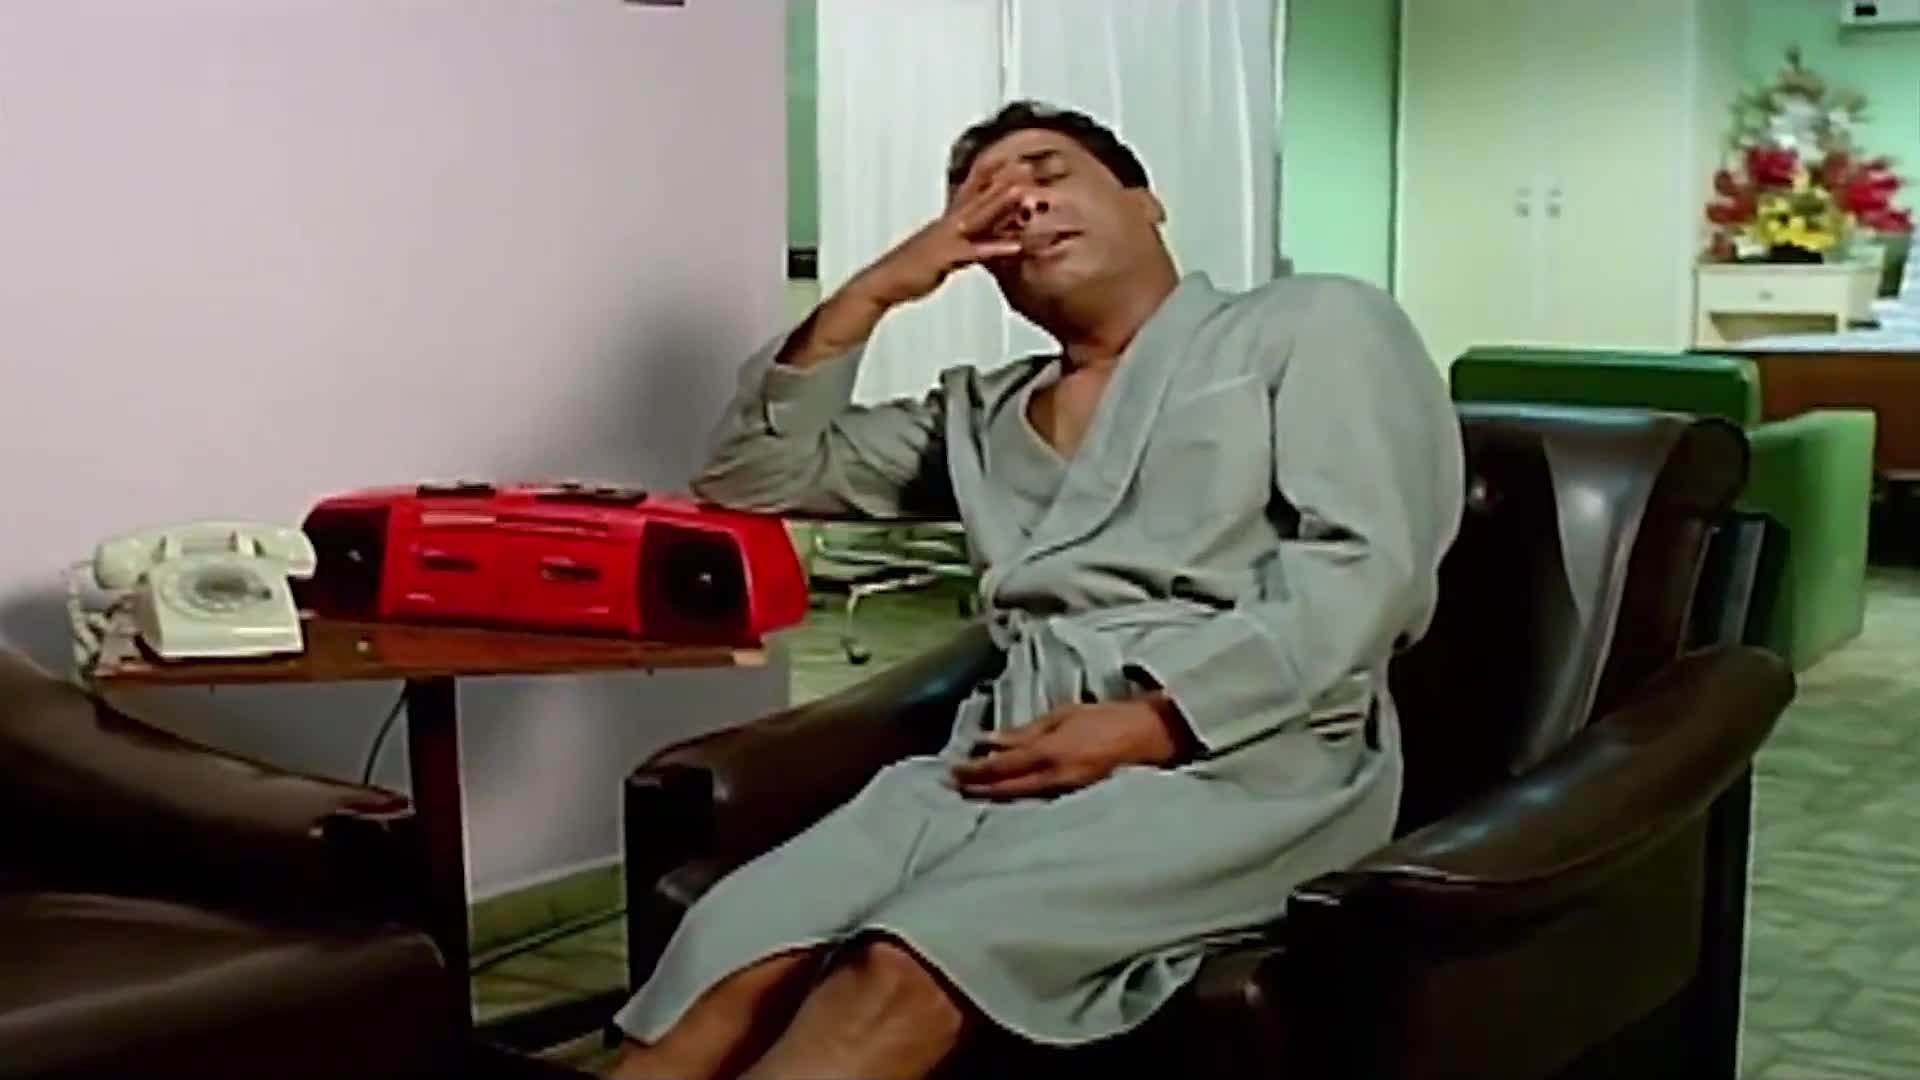 [فيلم][تورنت][تحميل][استاكوزا][1996][1080p][Web-DL] 10 arabp2p.com